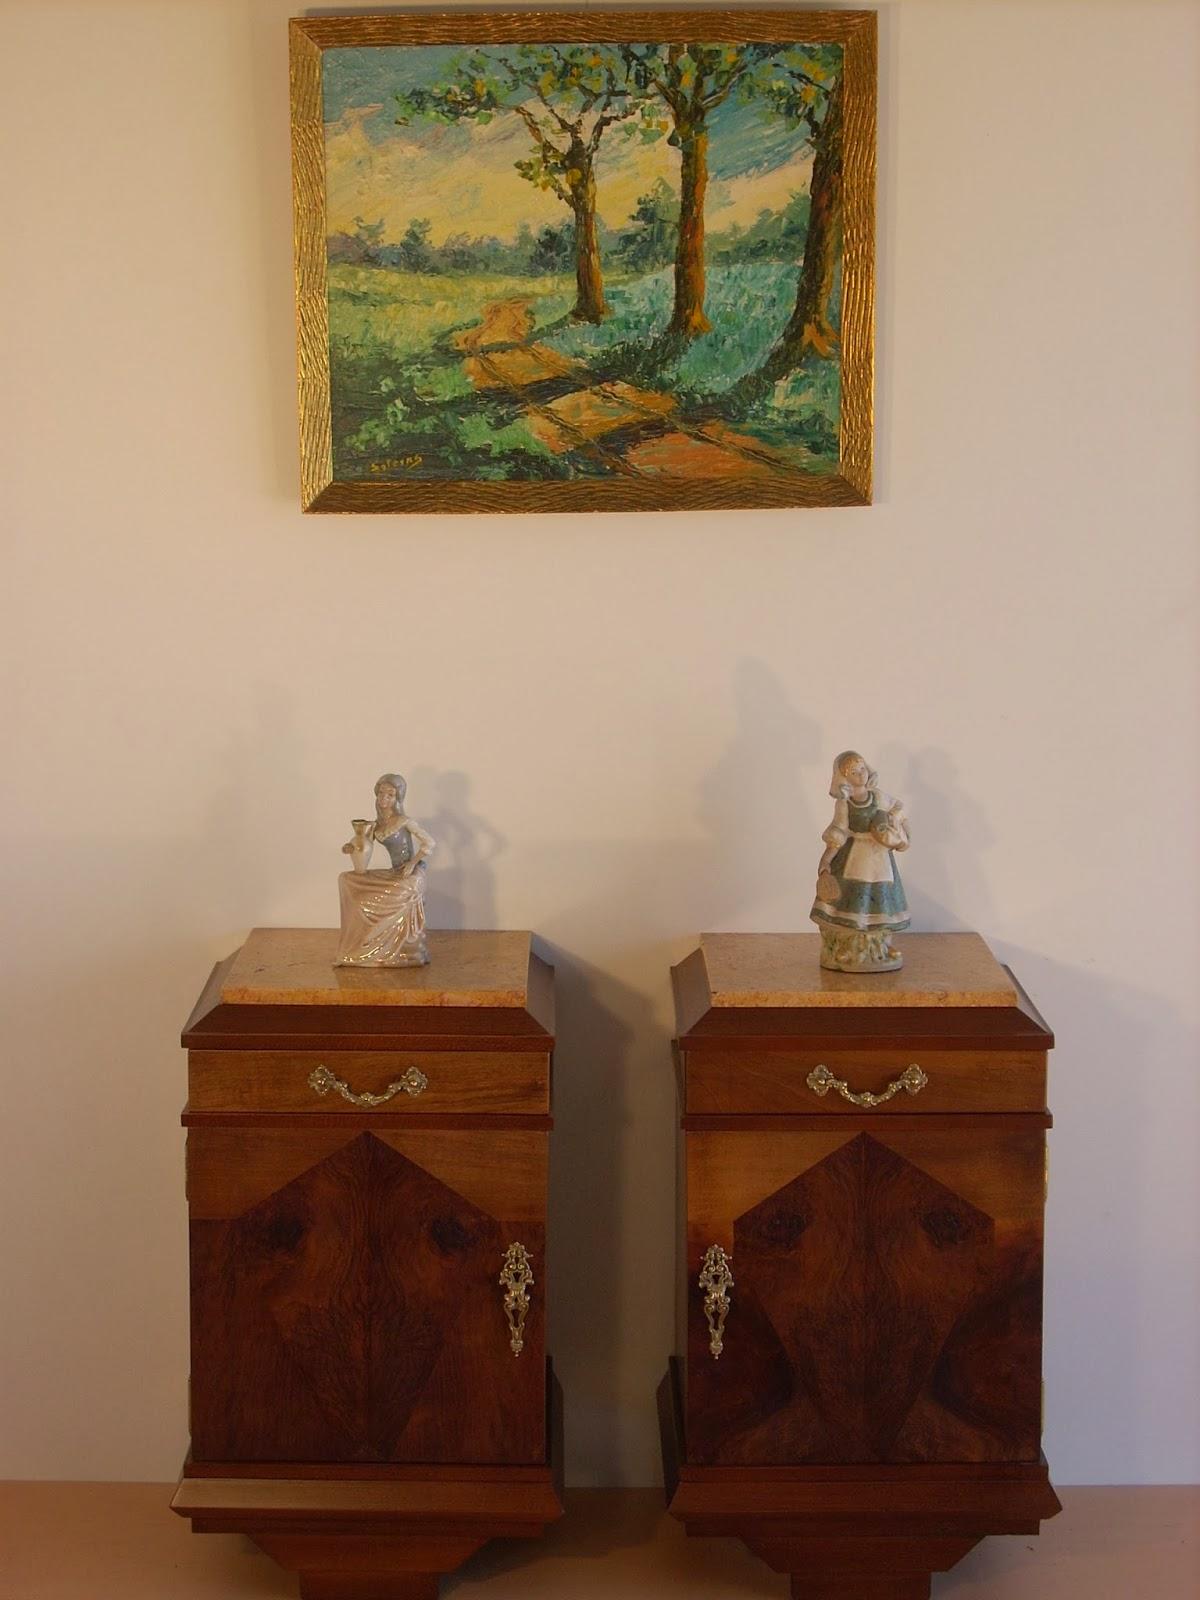 Venta de muebles antiguos restaurados naturmoble - Comprar muebles antiguos ...